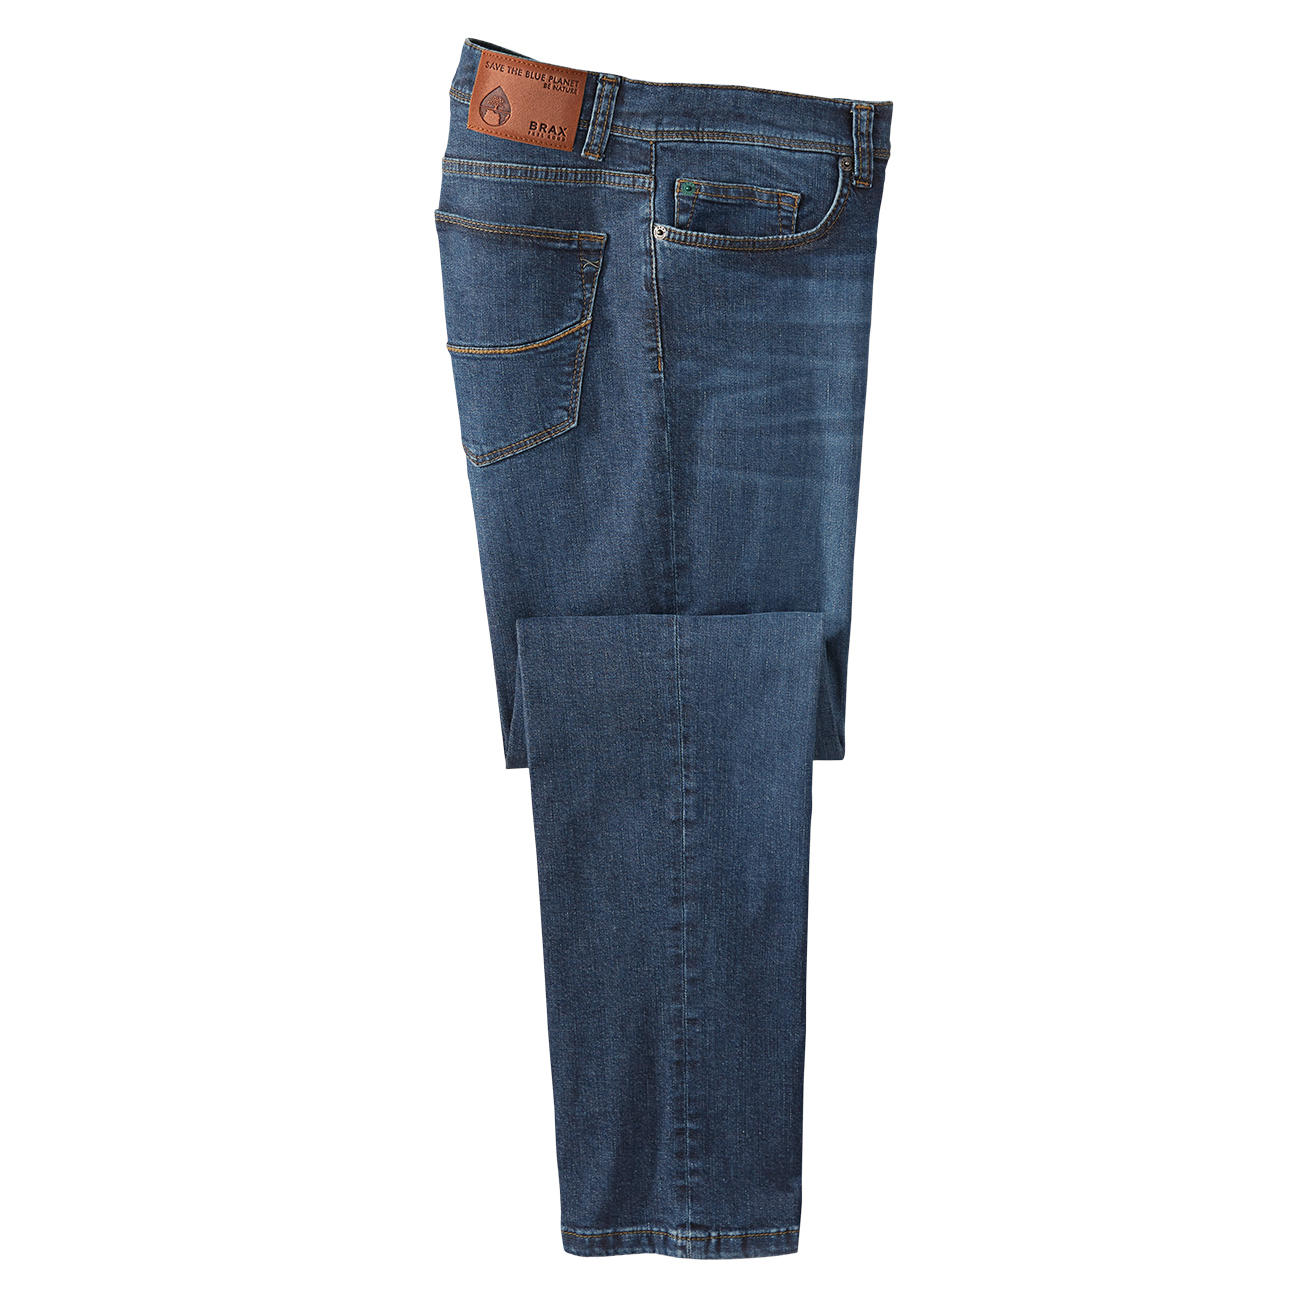 premium selection 50% price premium selection Brax Blue-Planet Jeans | Discover fashion classics